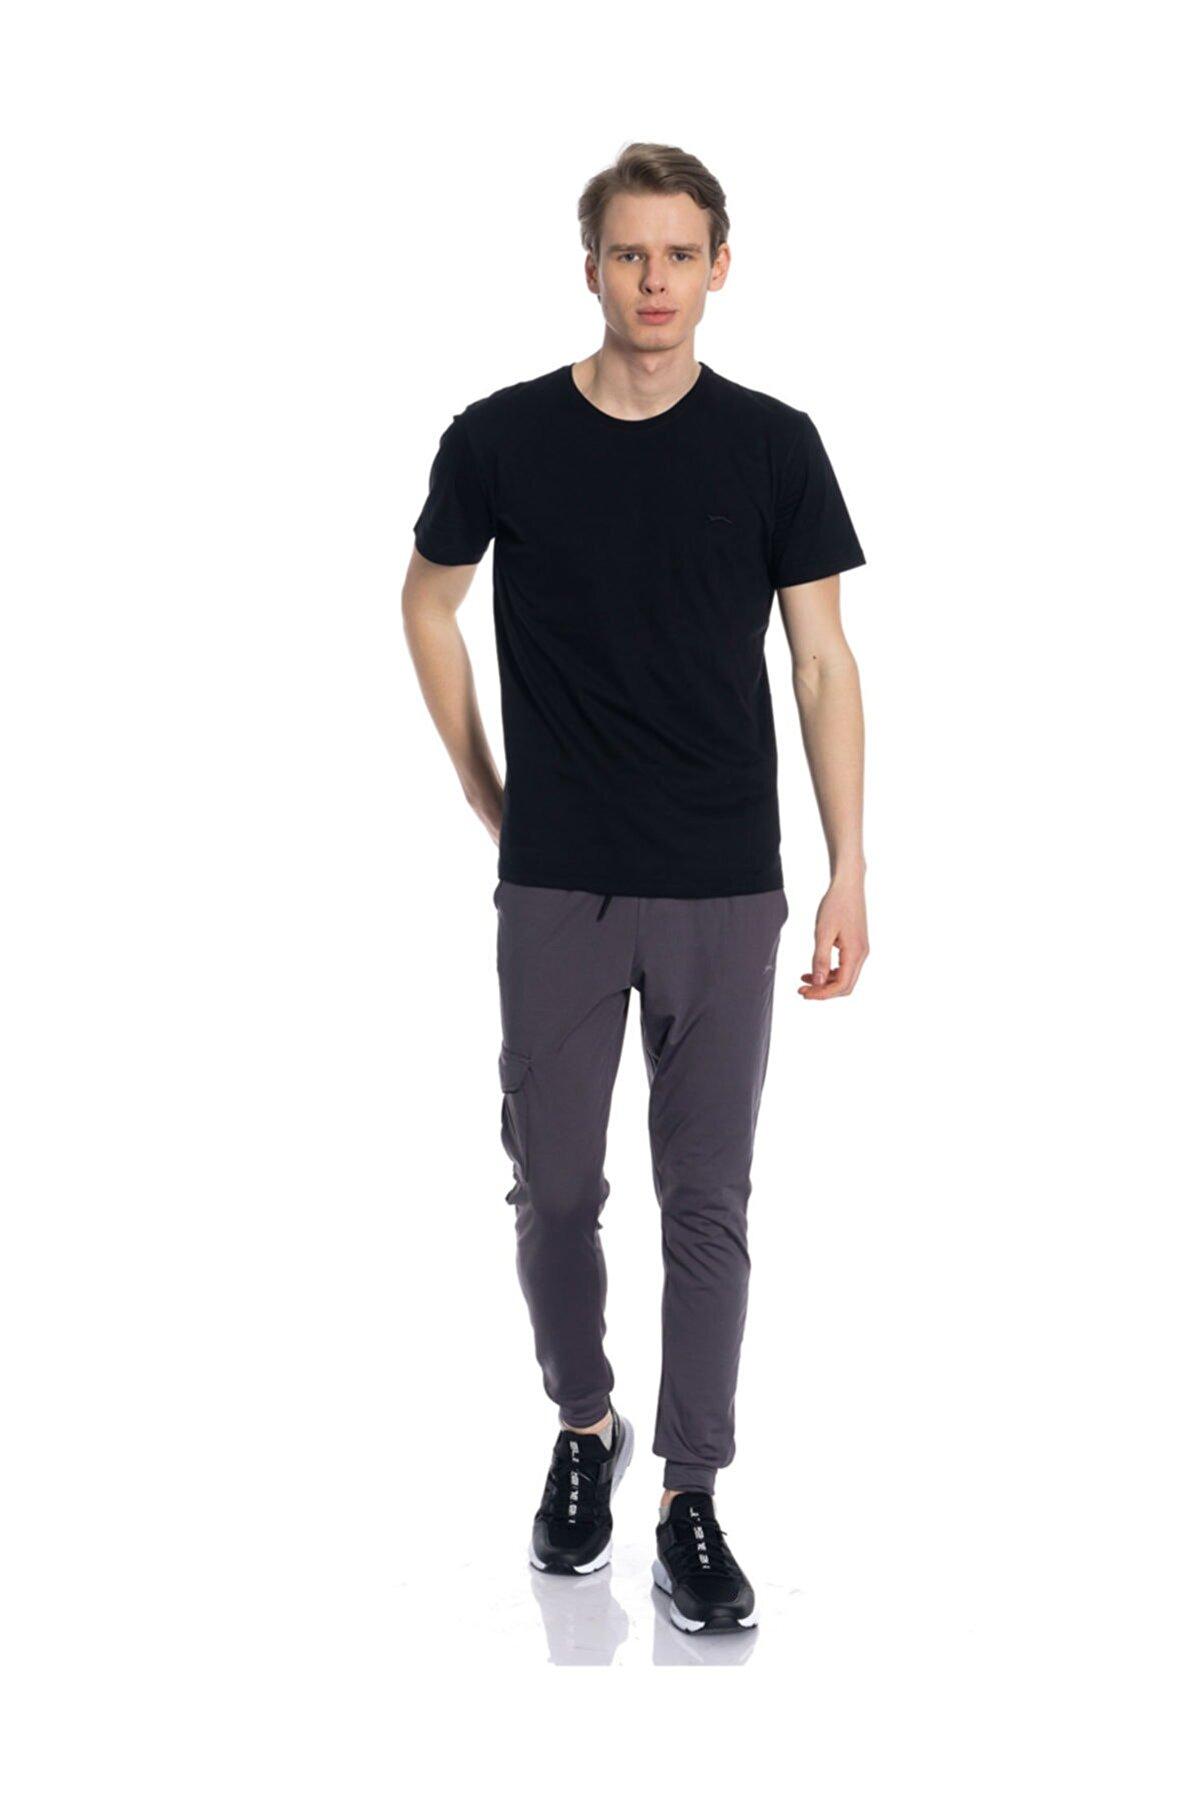 Slazenger Sander Erkek T-shirt Siyah St10te020